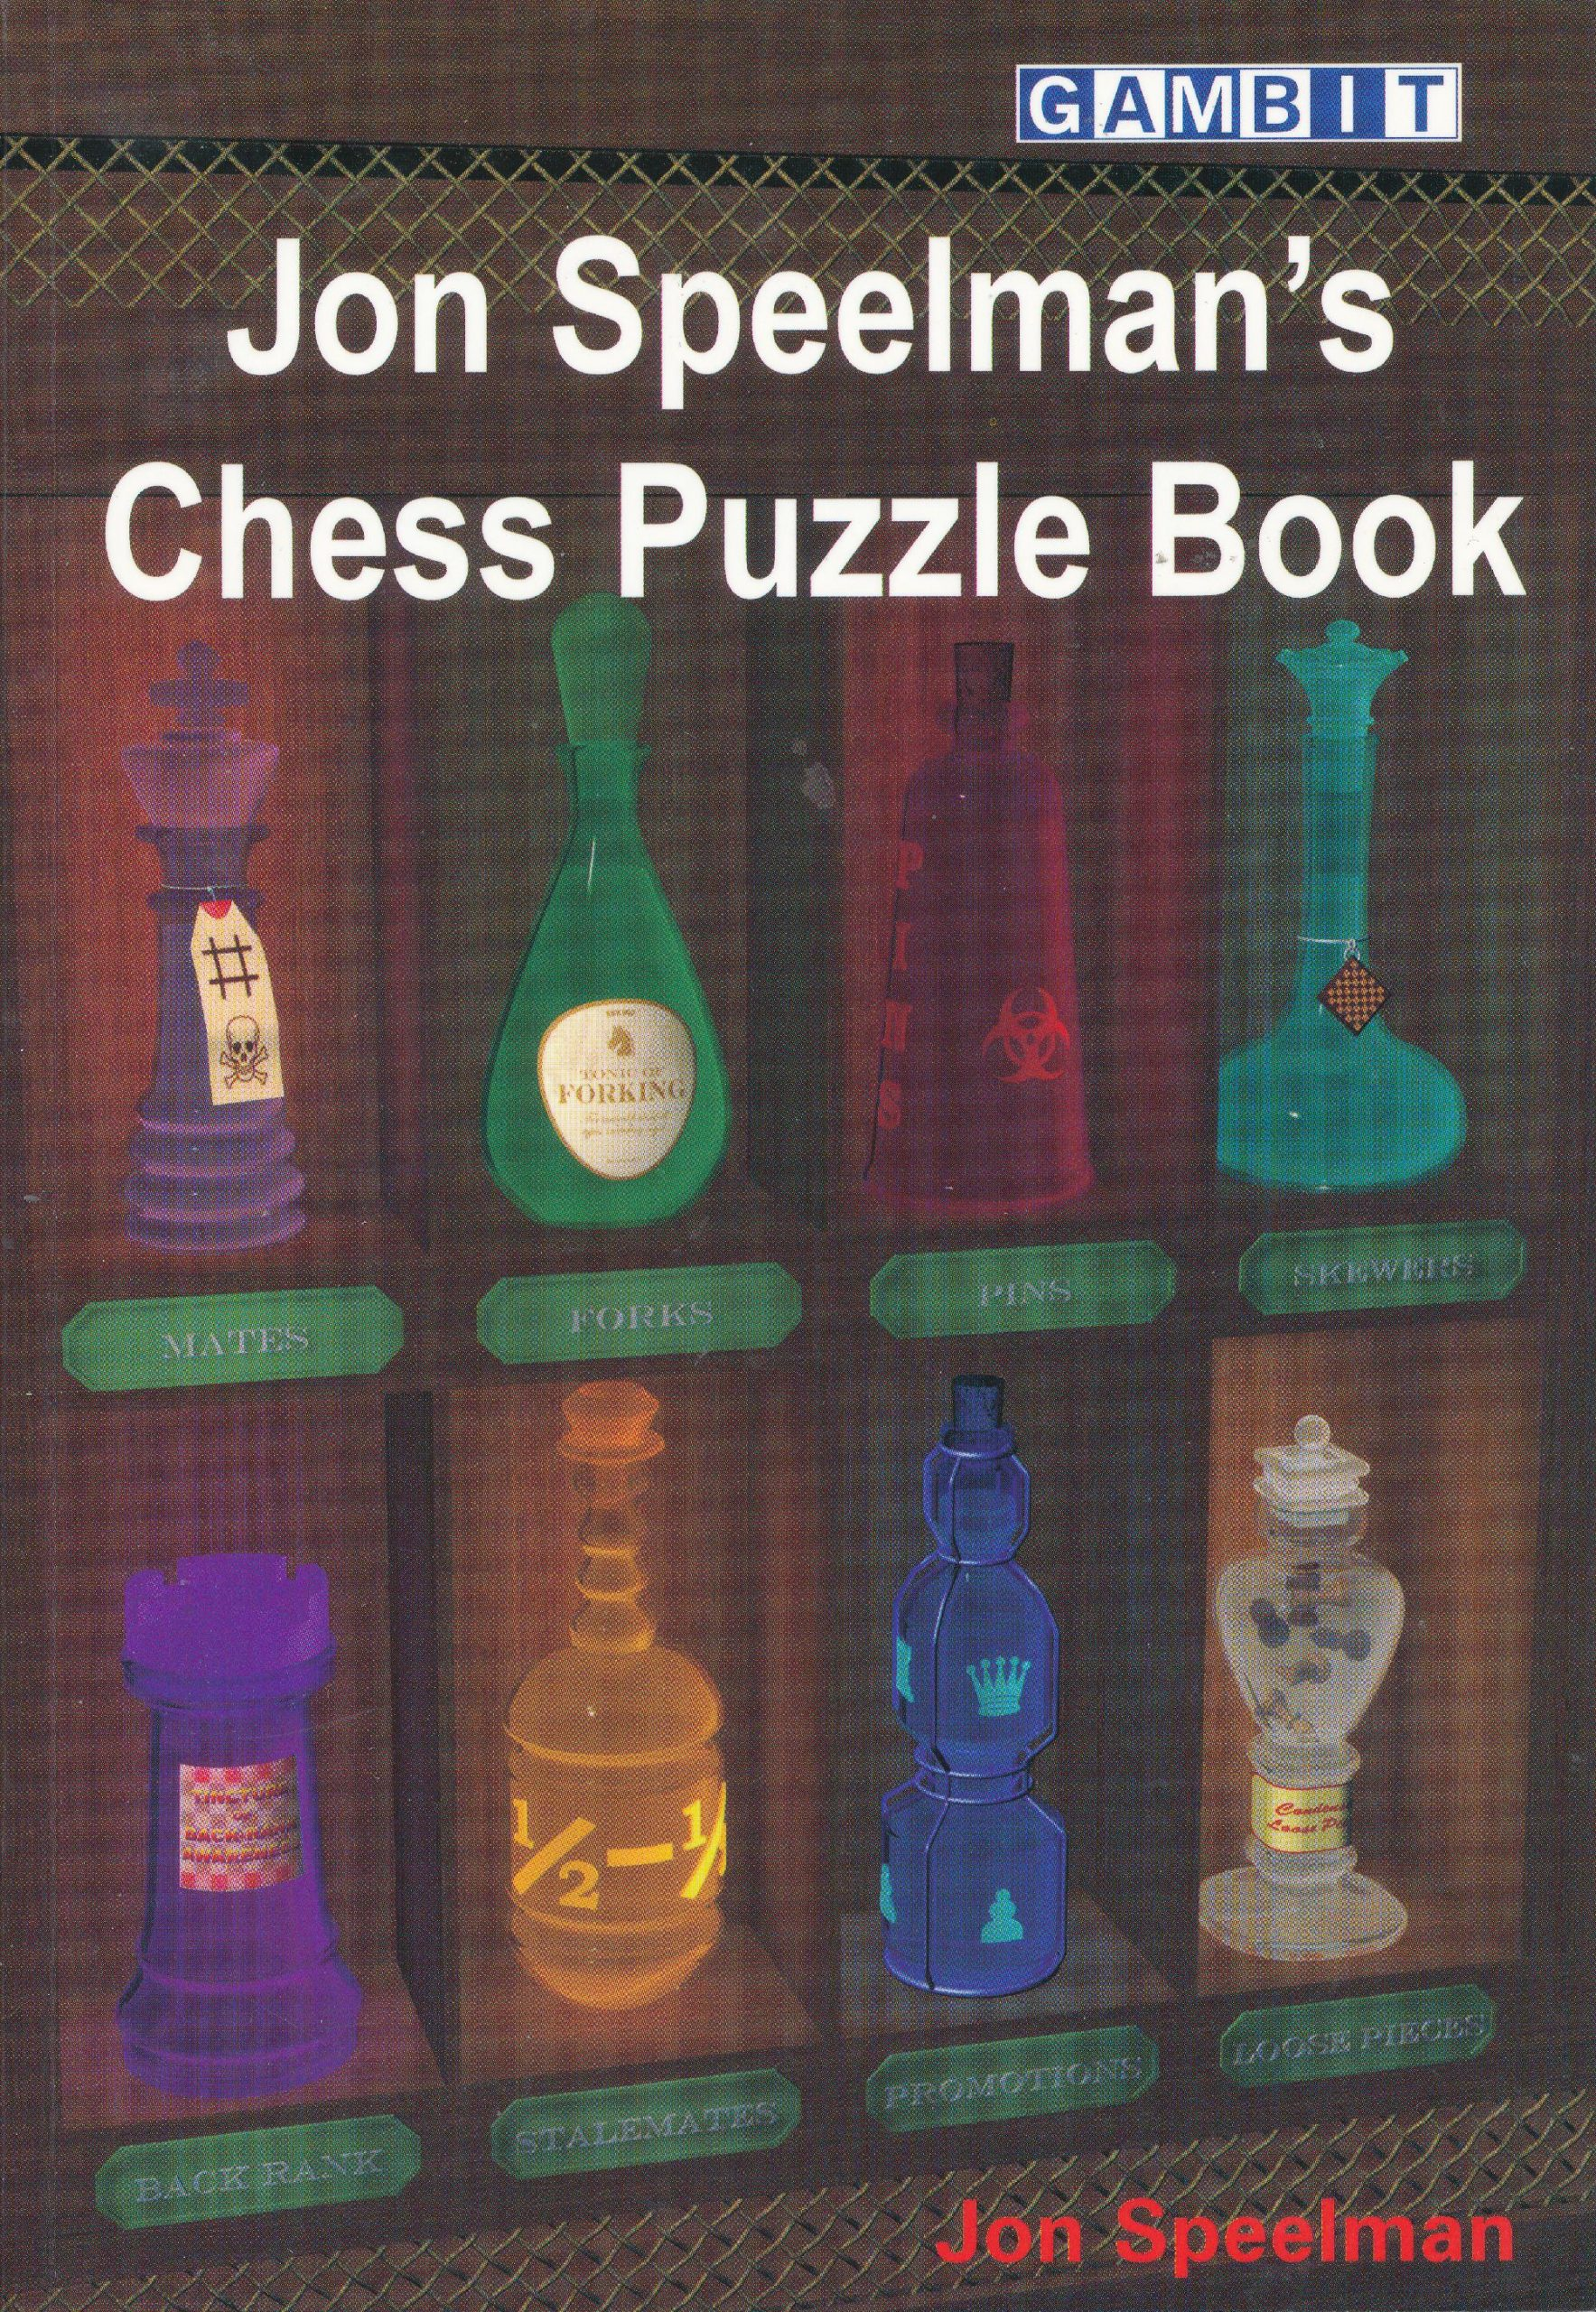 Speelman, Jon (2008). Jon Speelman's Chess Puzzle Book. Gambit Publications Ltd. 143 pages. ISBN 978-1-904600-96-1.